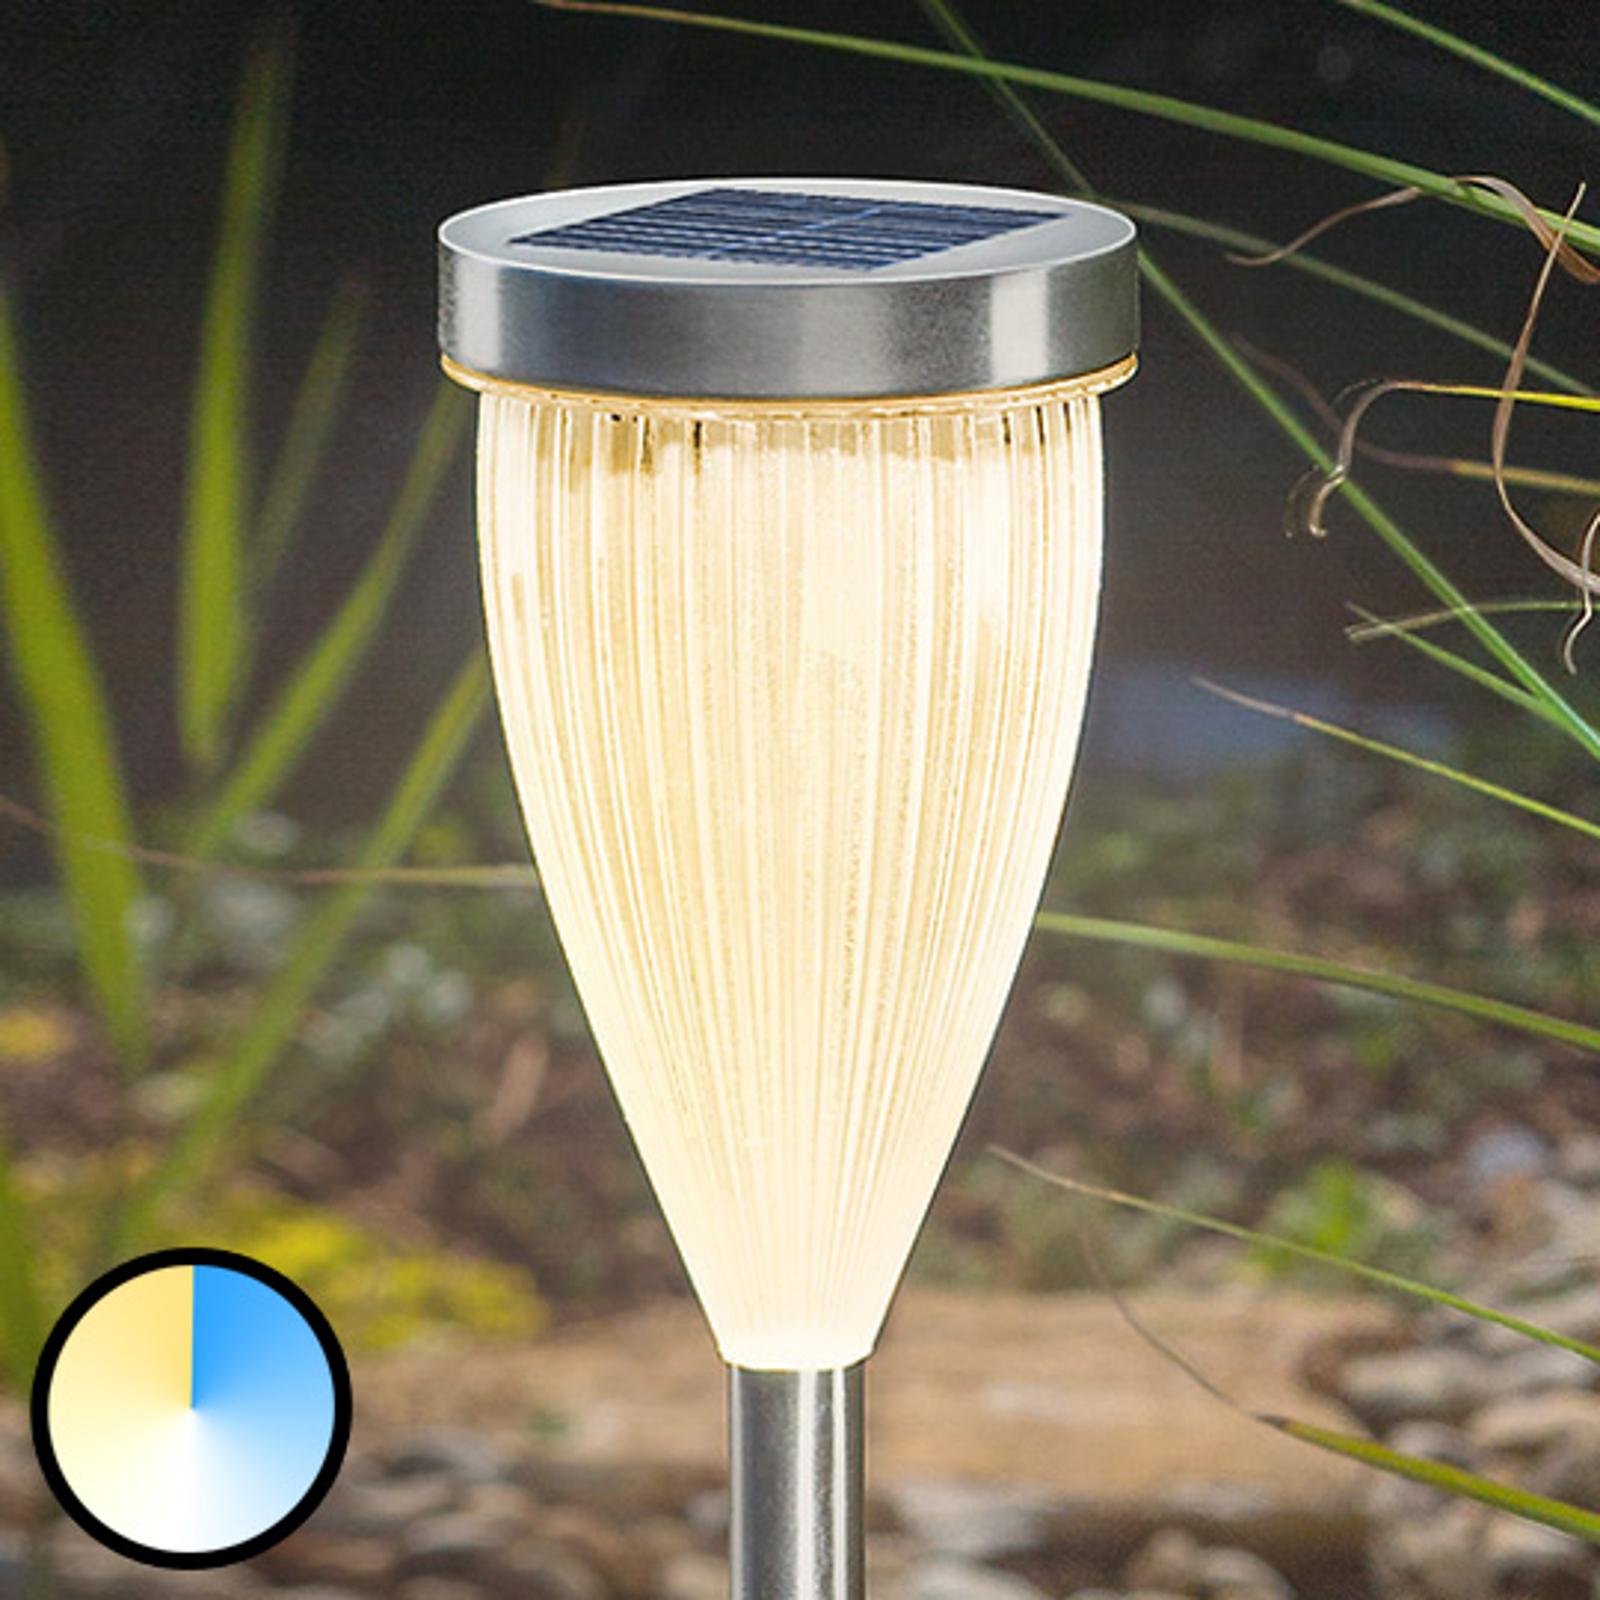 Dream Light - elegante lampada solare a LED